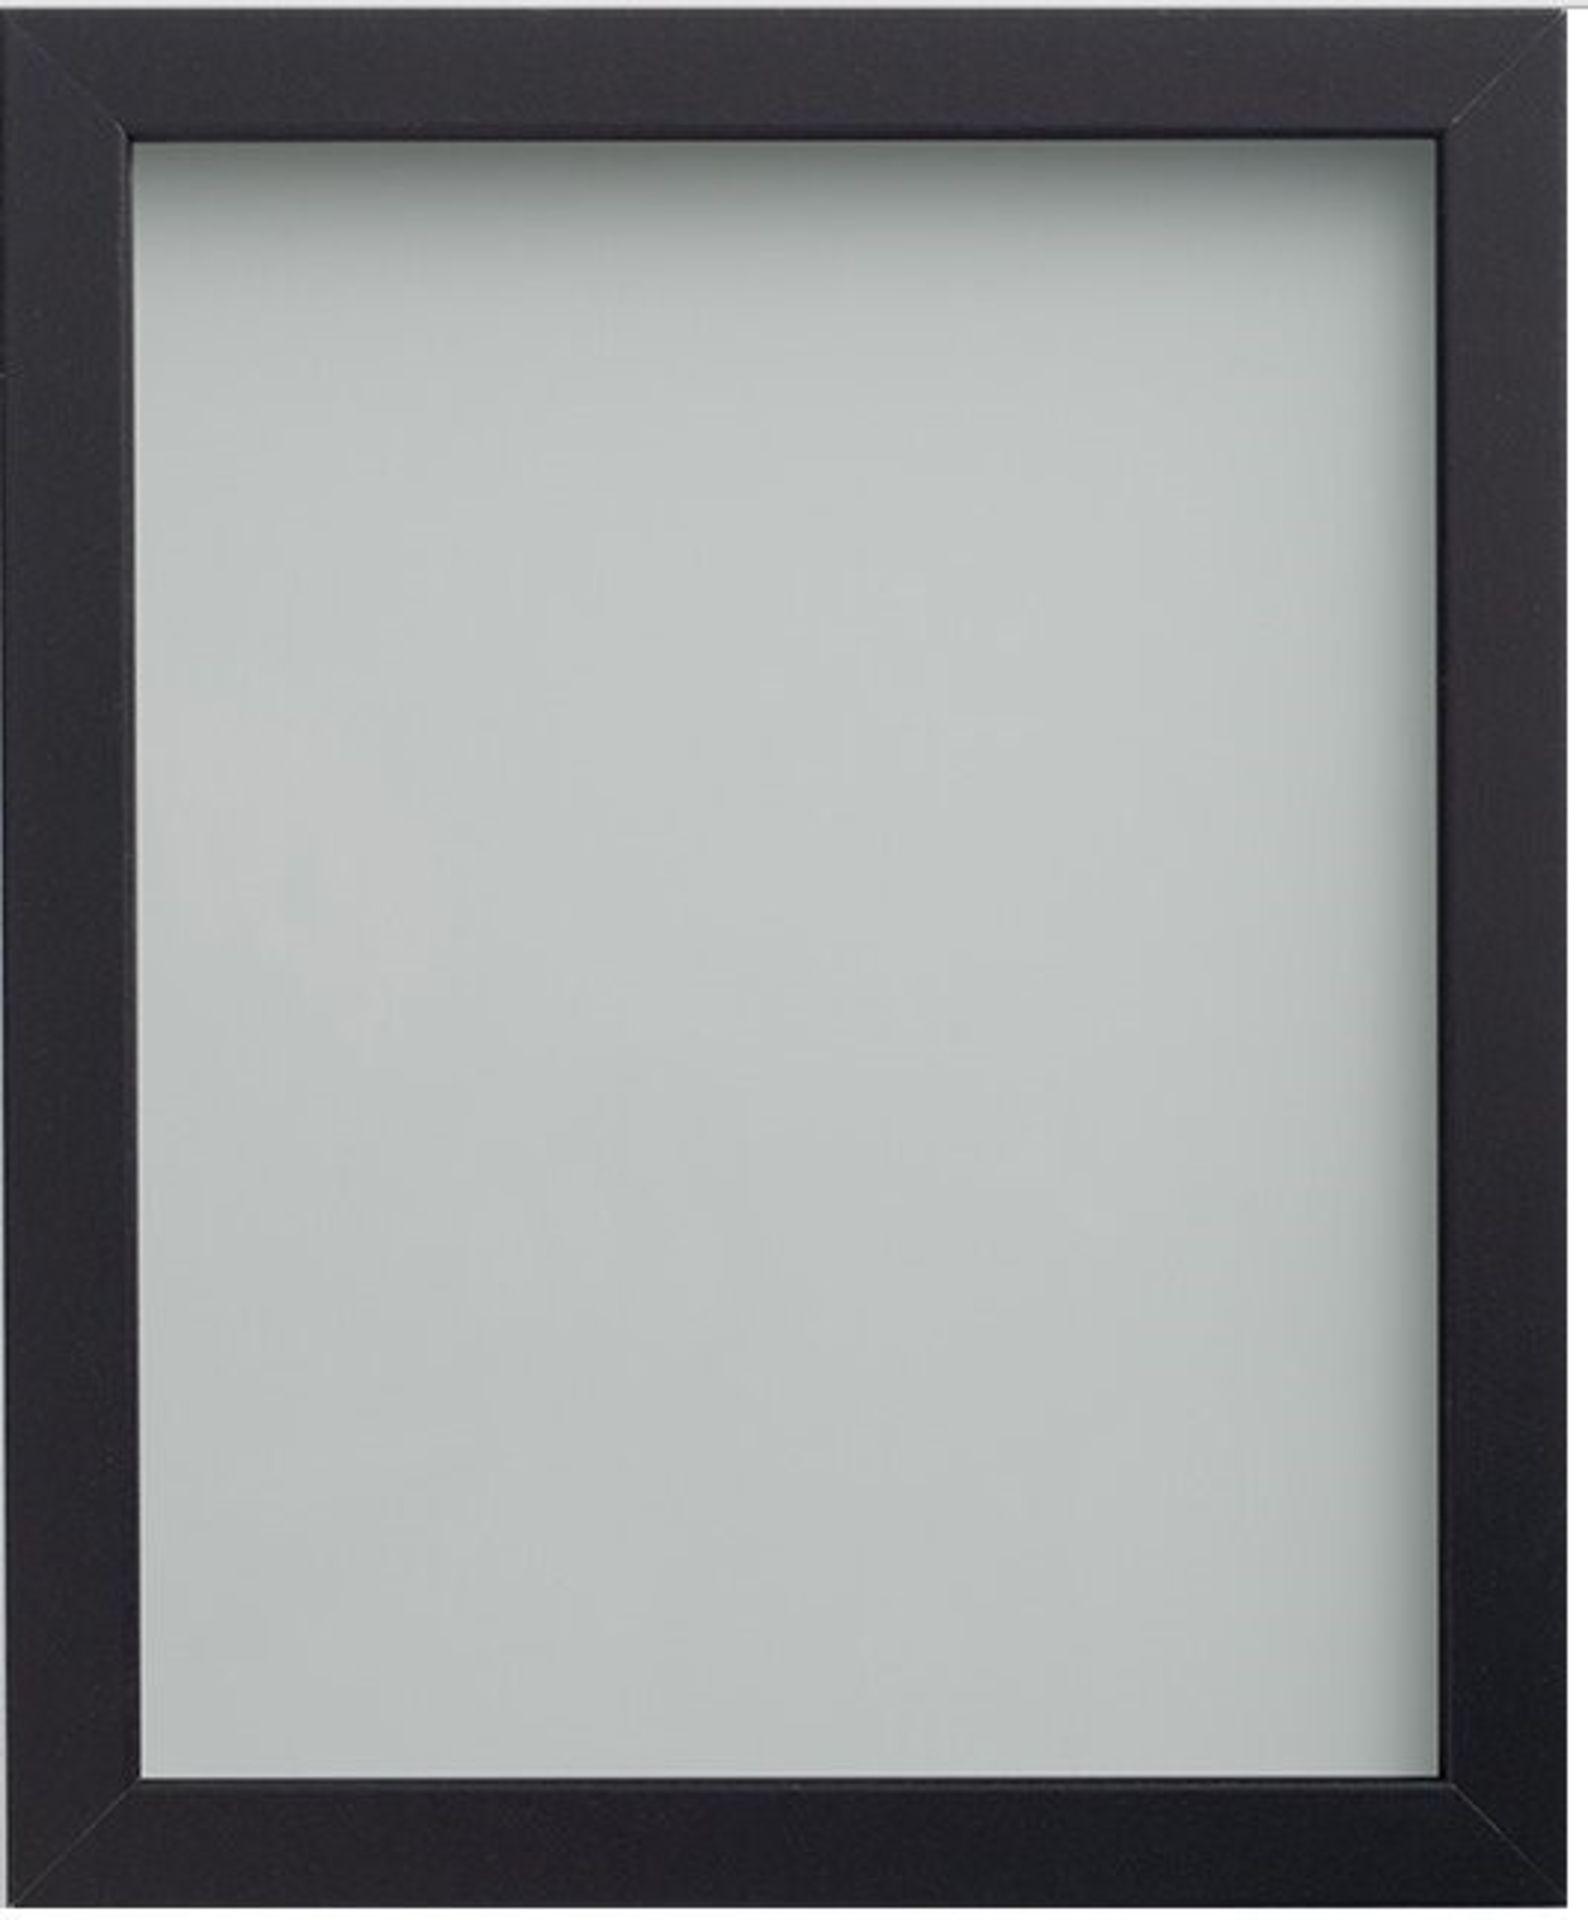 Wayfair Basics™, Swartwood Picture Frame (BLACK) - RRP£11.53 (FRCO1006 - 22262/1) 1A